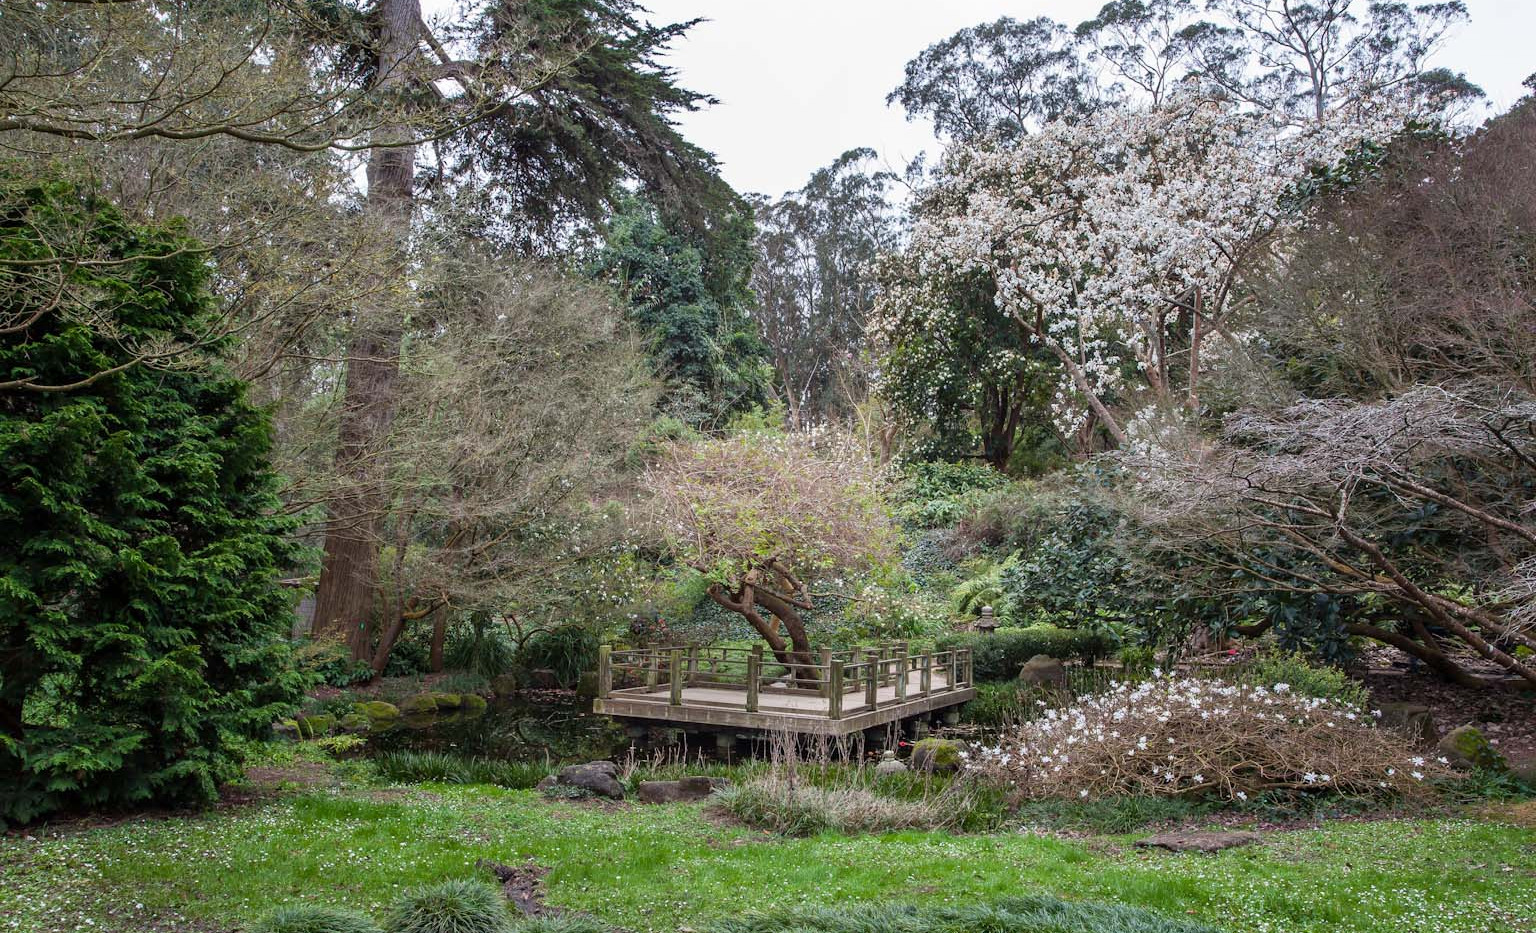 Magnolia campbellii 'Strybing White' over the Moon Viewing Garden